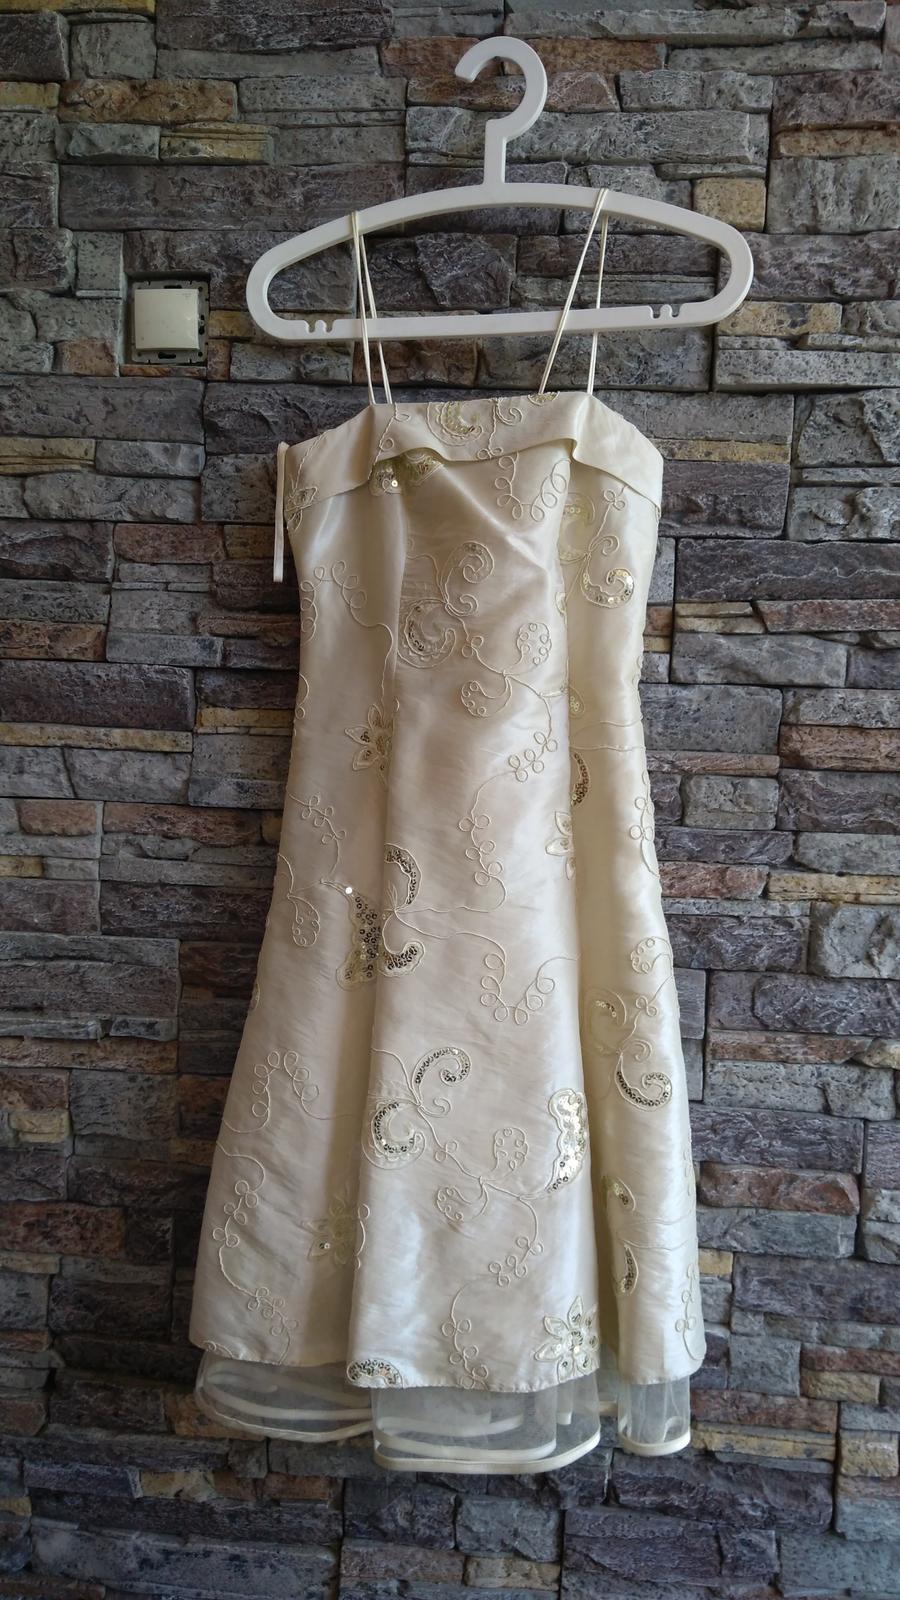 Zlaté šaty s flitrami po kolená - Obrázok č. 2